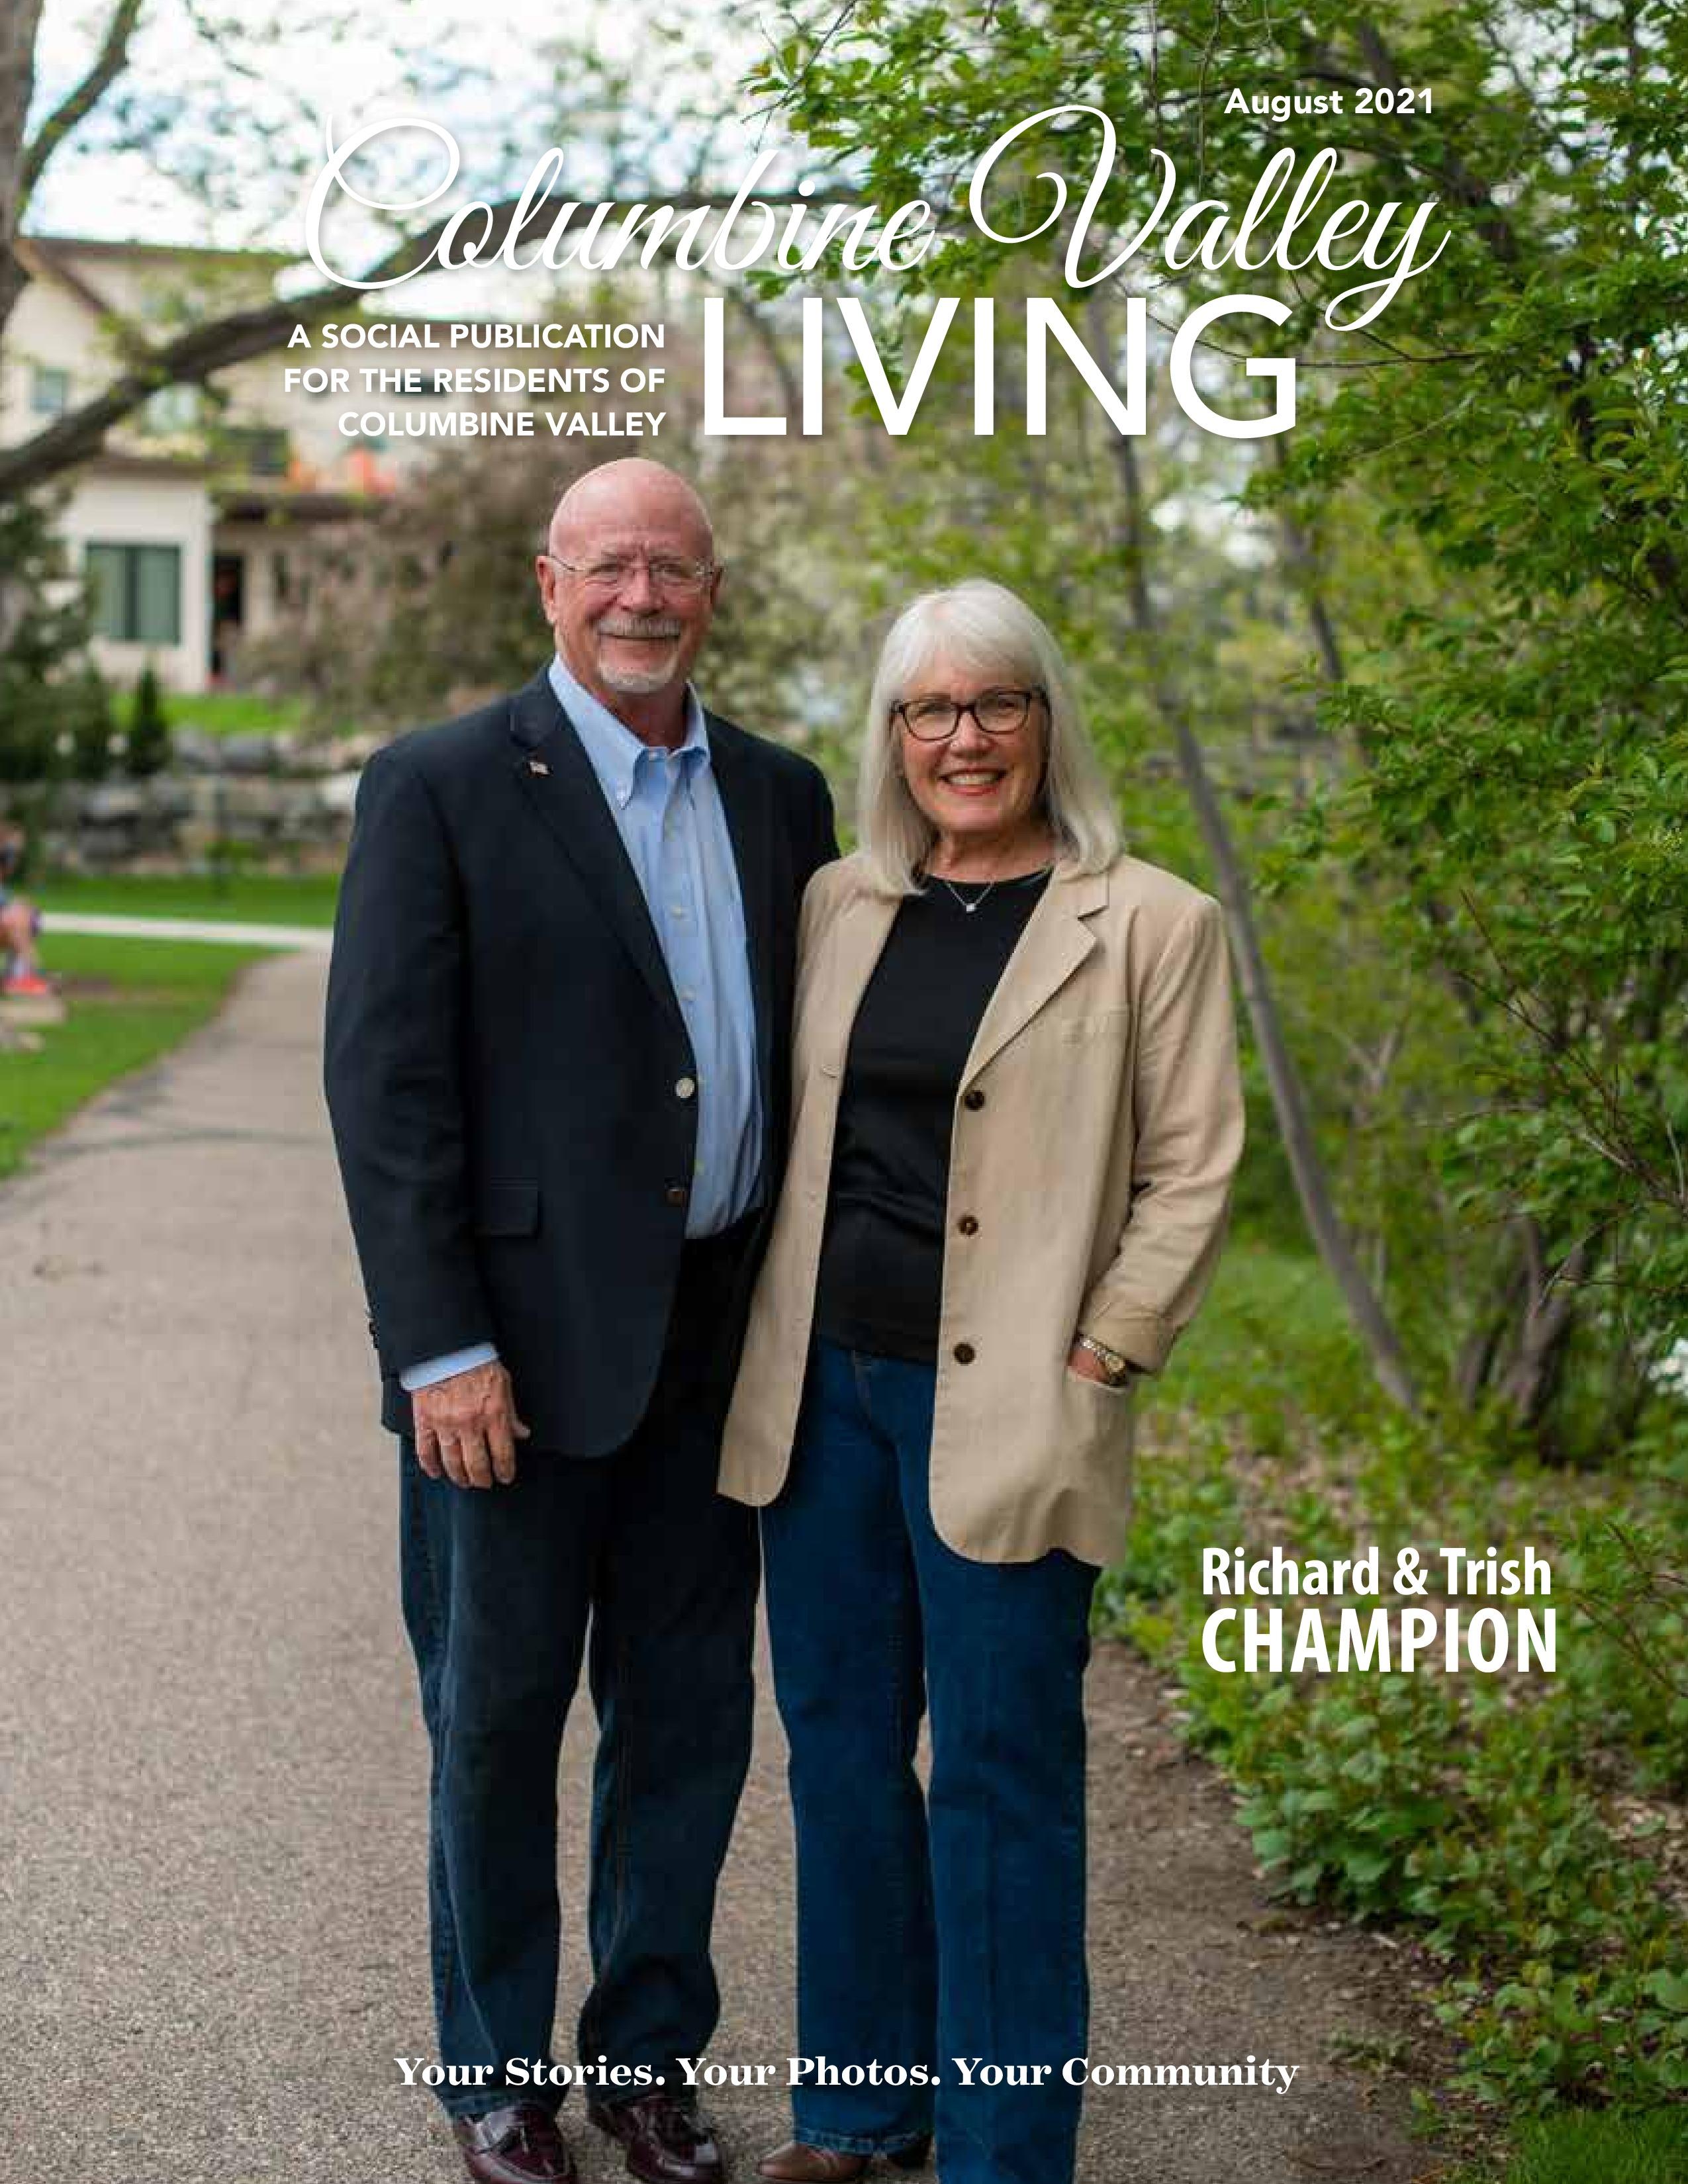 Columbine Valley Living 2021-08-01